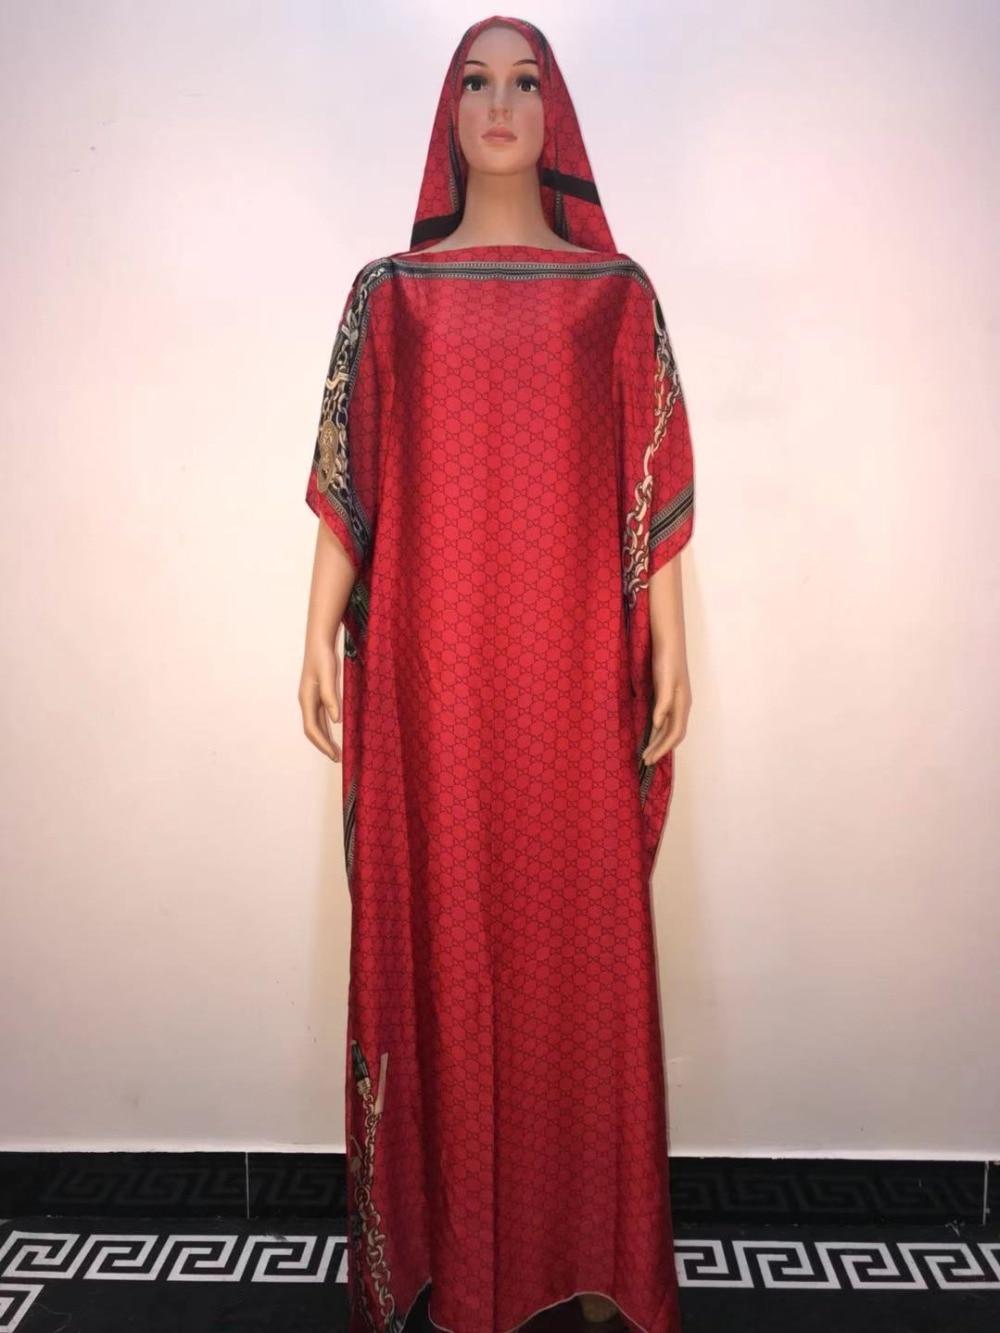 Hot Sale 2019 Summer Muslim Women Long Dress High Quality Size 145 Cm Length Fashion African Dress For Women